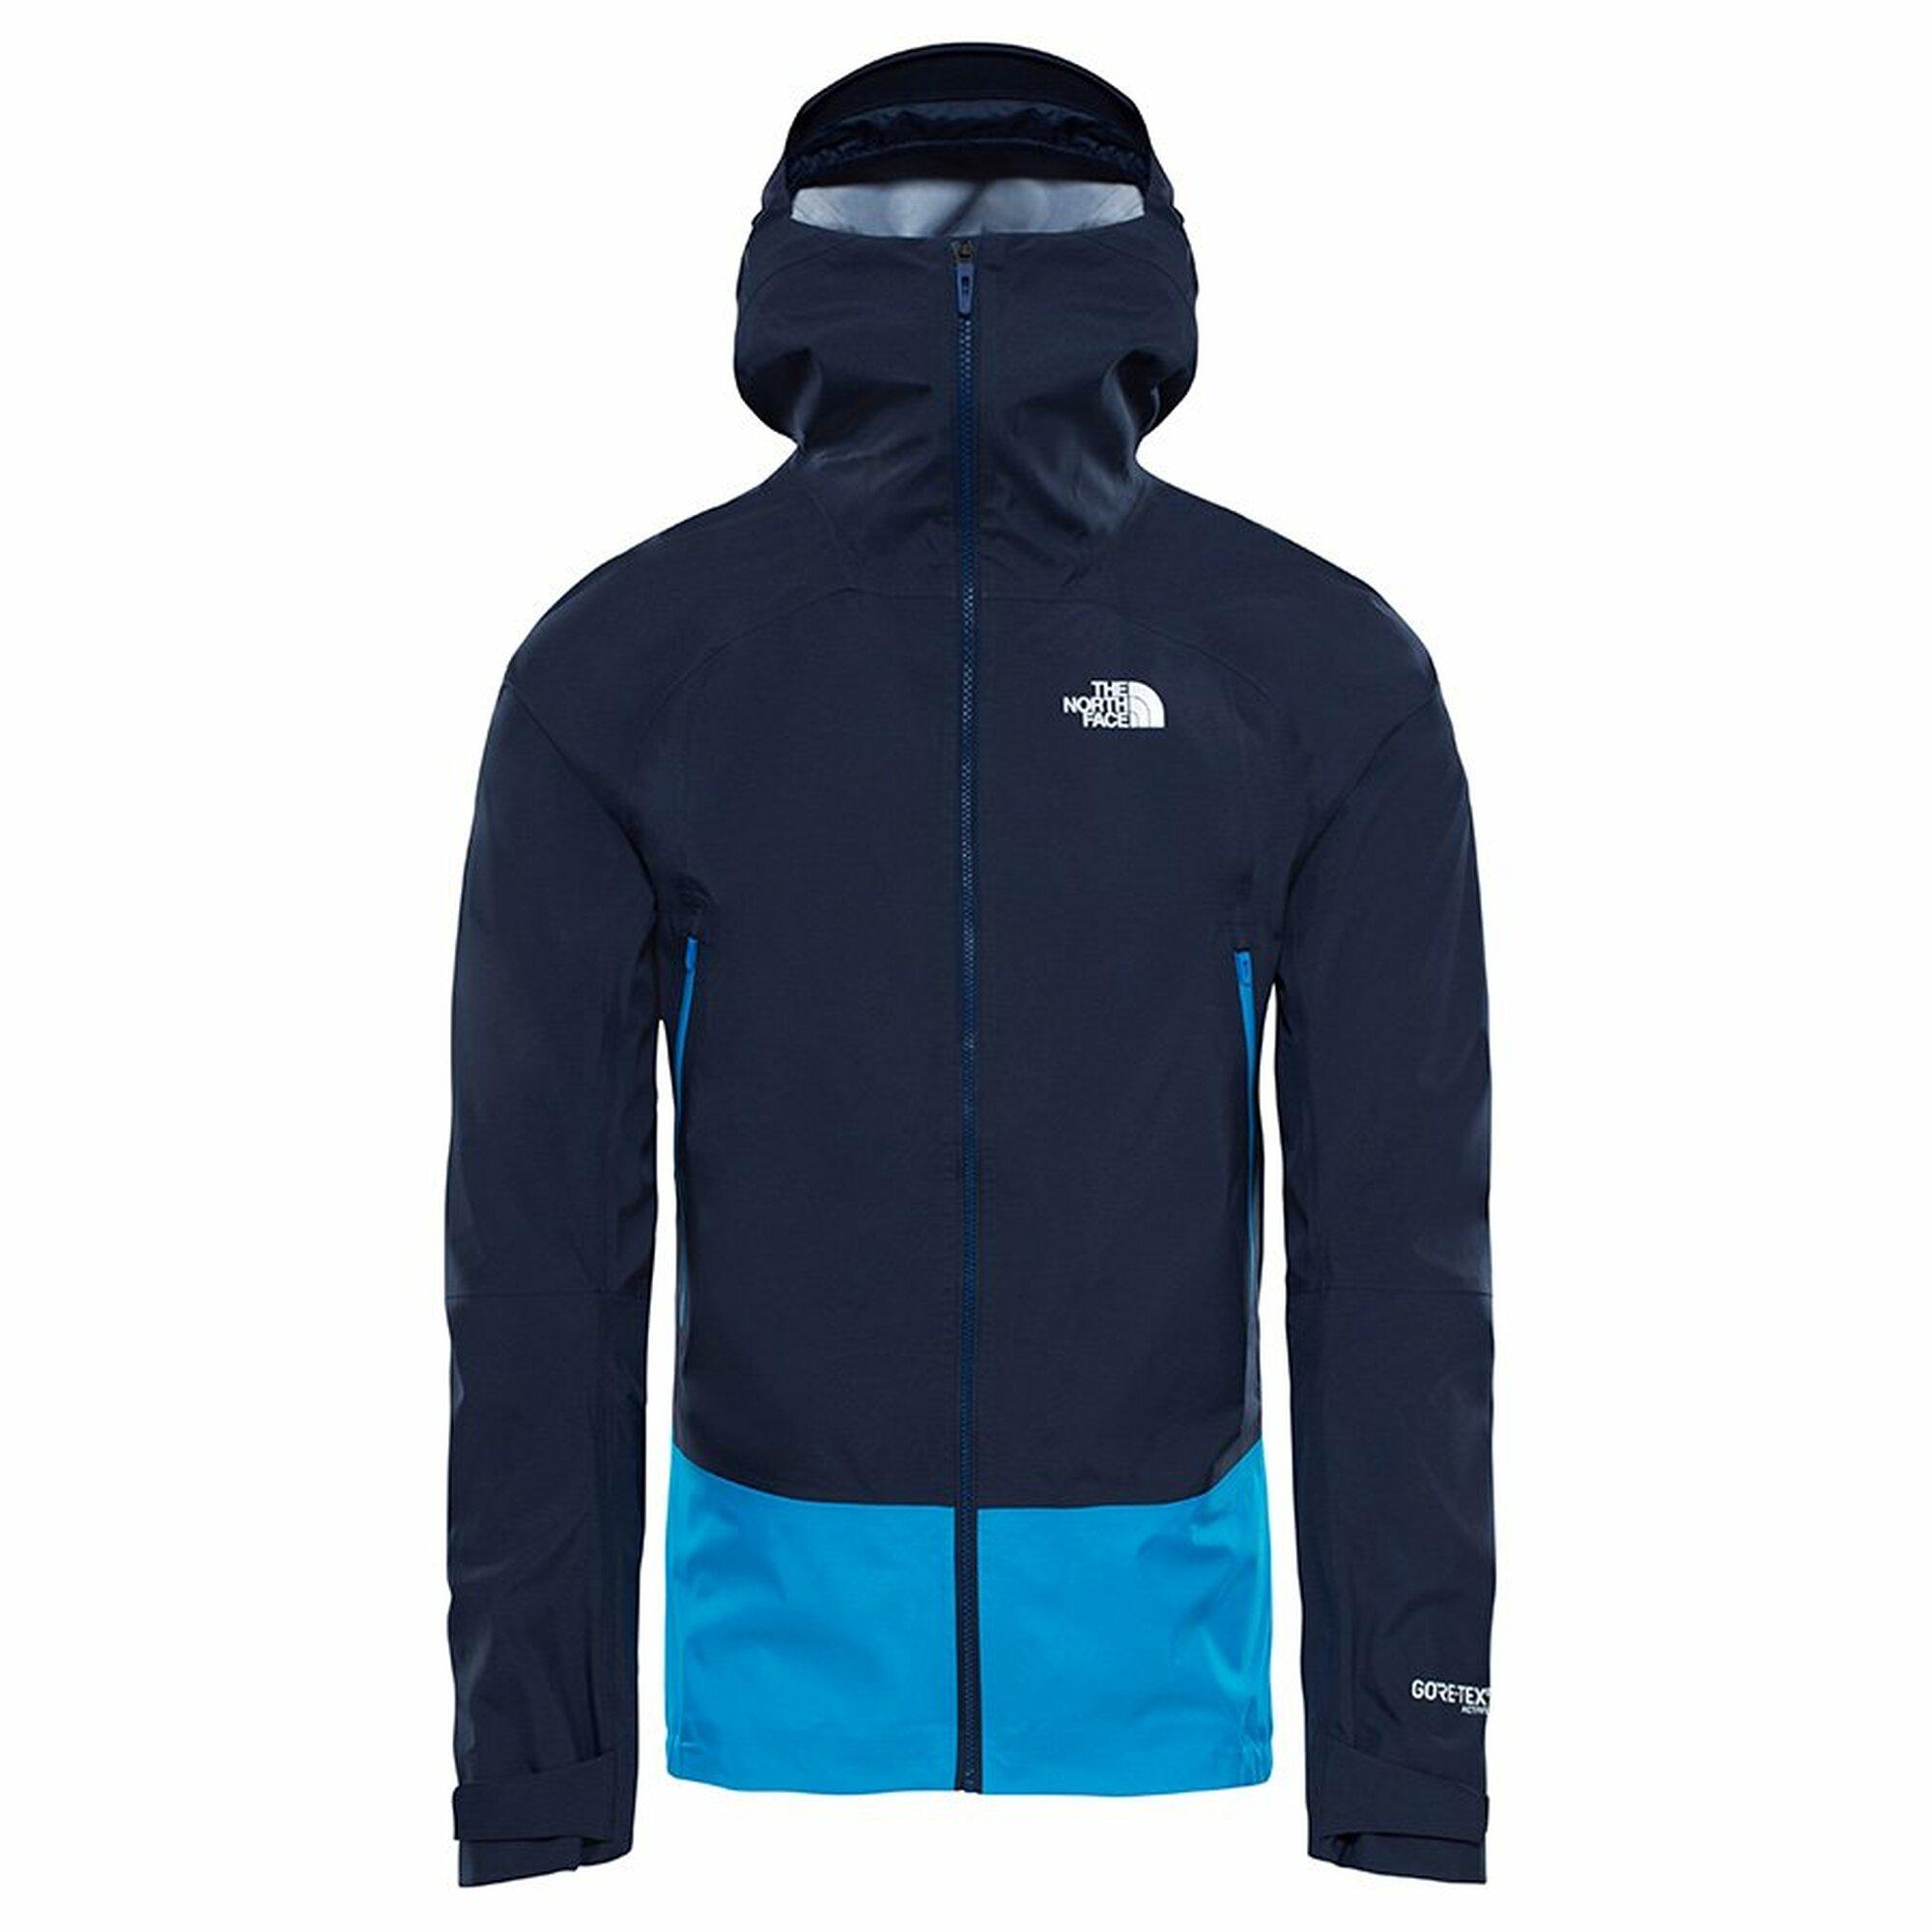 The North Face Exolight Mountain Jacket